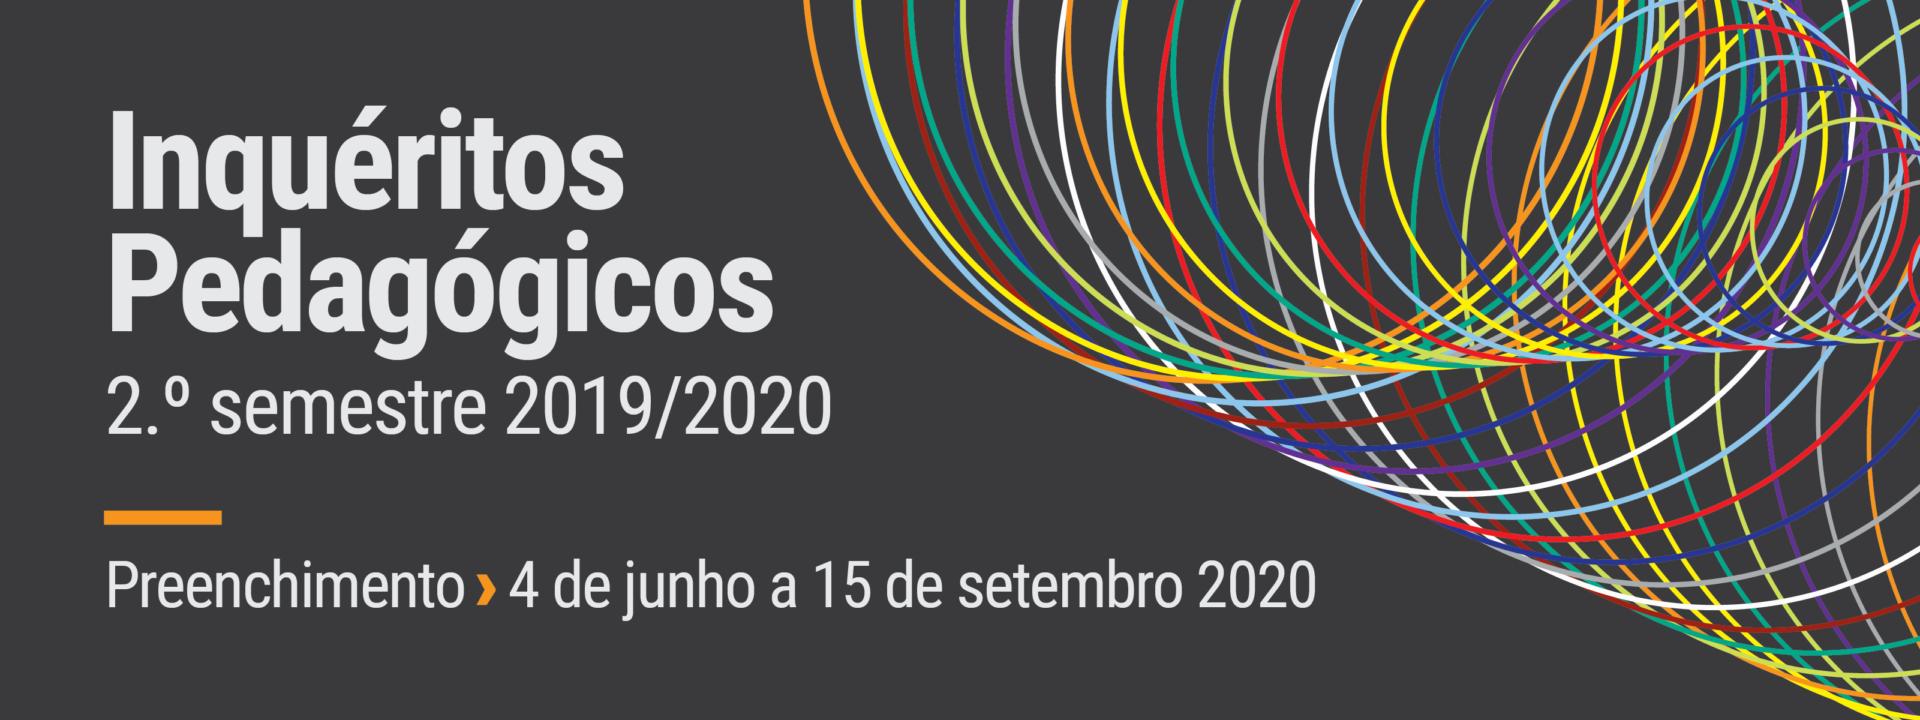 Preenchimento dos IPUPs 2º semestre 2019/2020